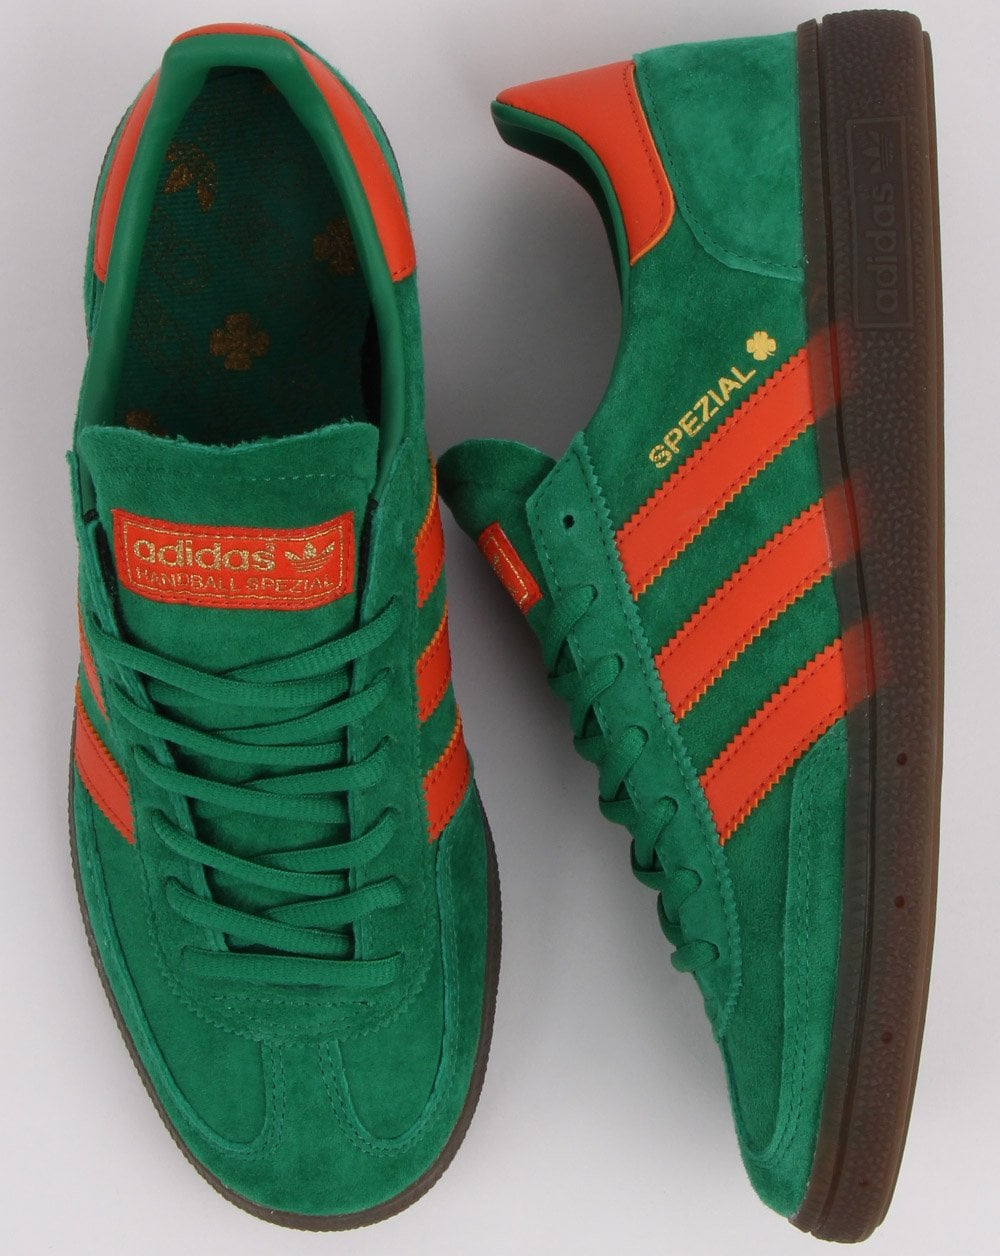 half off 8a6be 5da3a adidas Trainers Adidas Spezial Trainers Bold Green  Orange